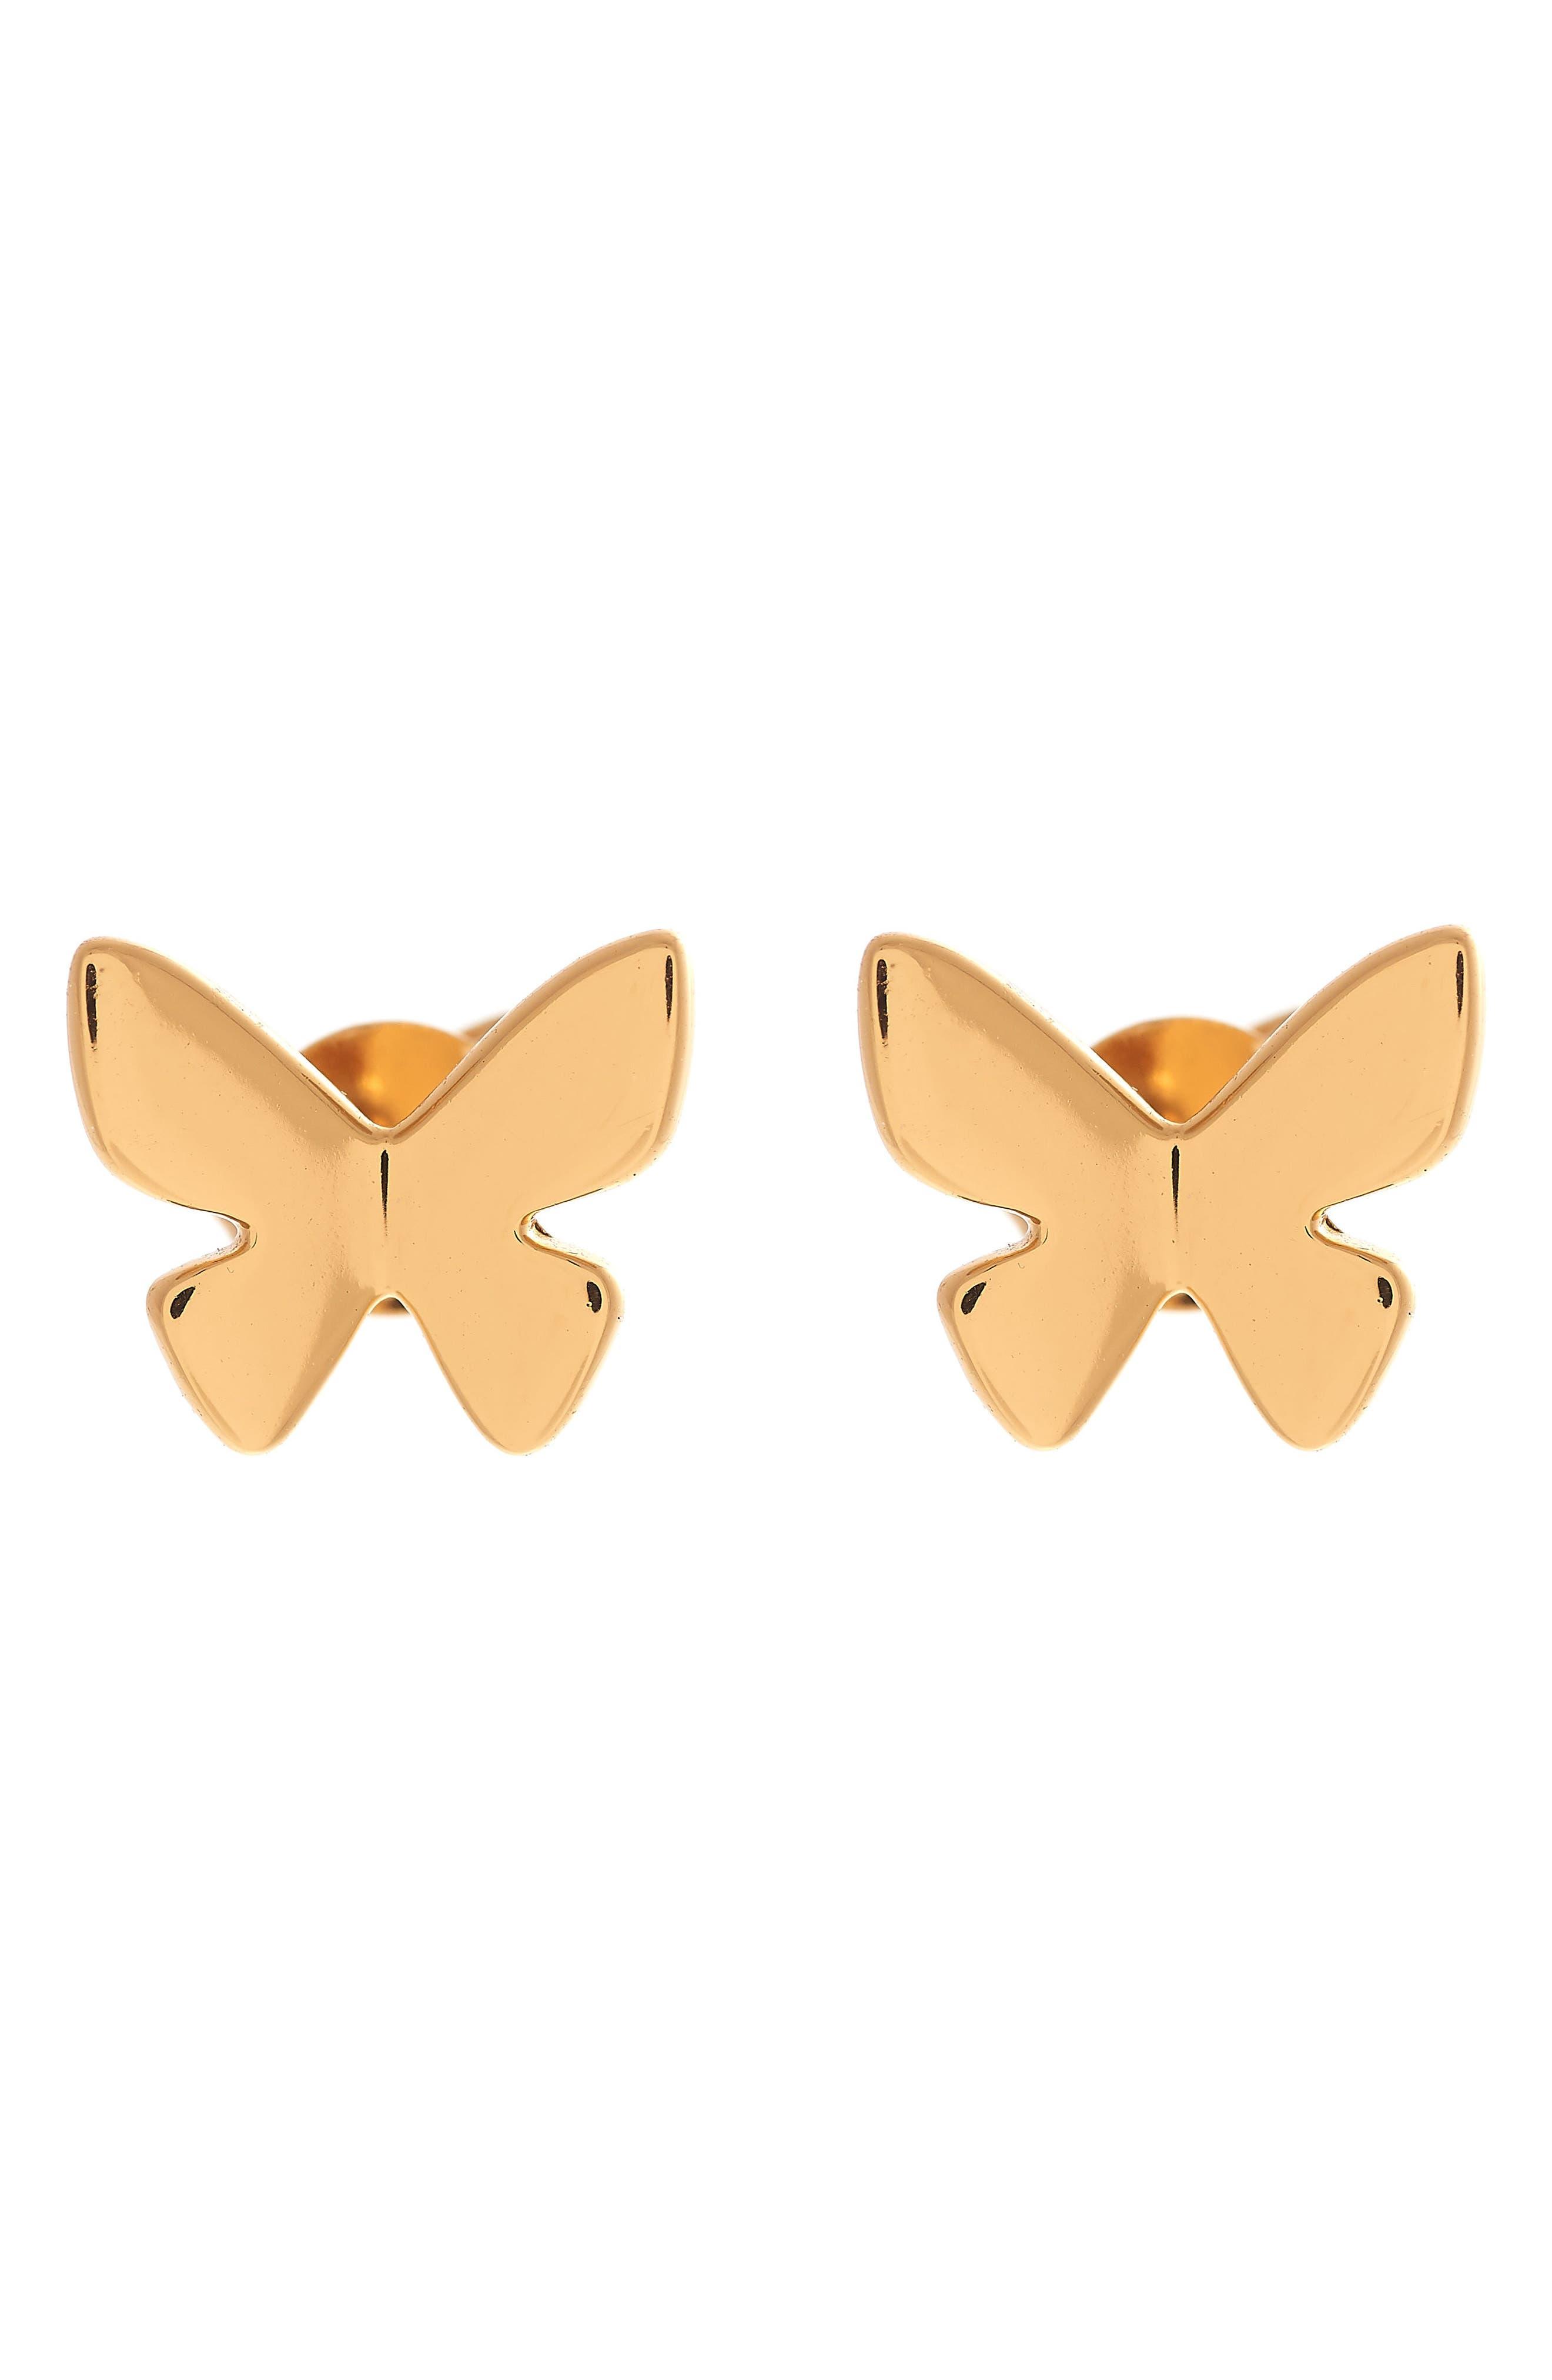 Social Butterfly Stud Earrings,                             Main thumbnail 1, color,                             Gold